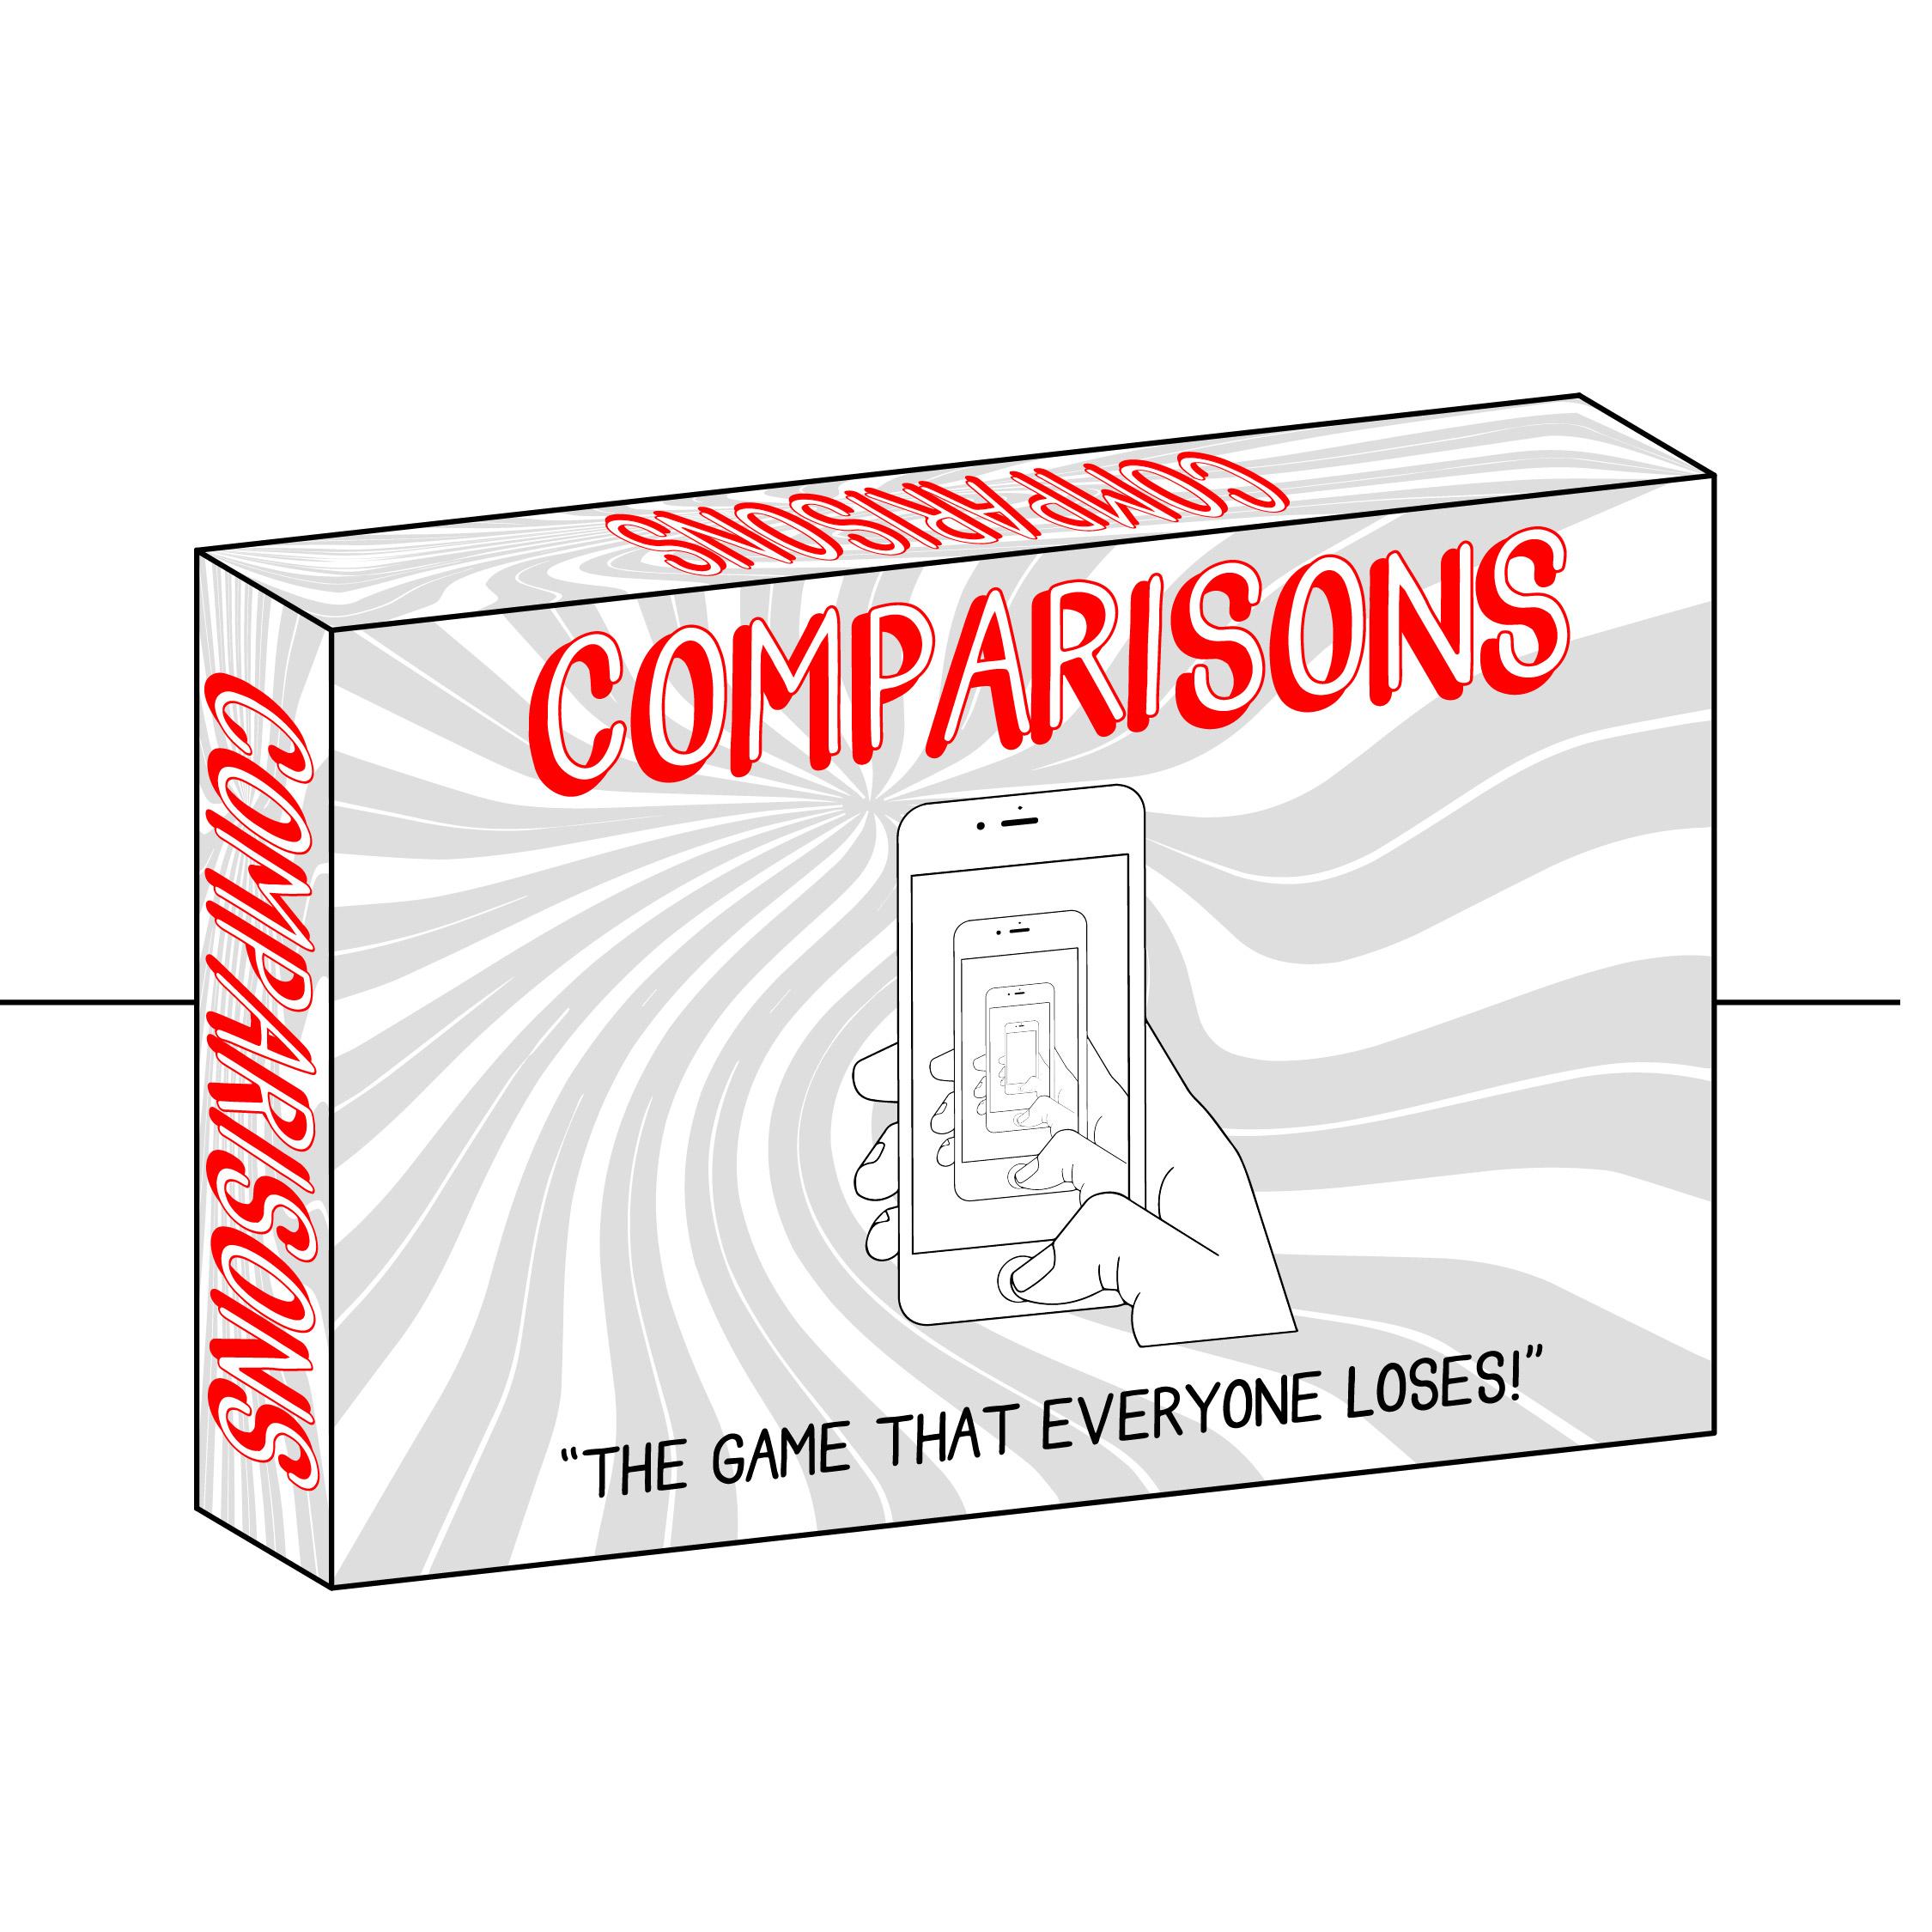 comparisons-01.jpg